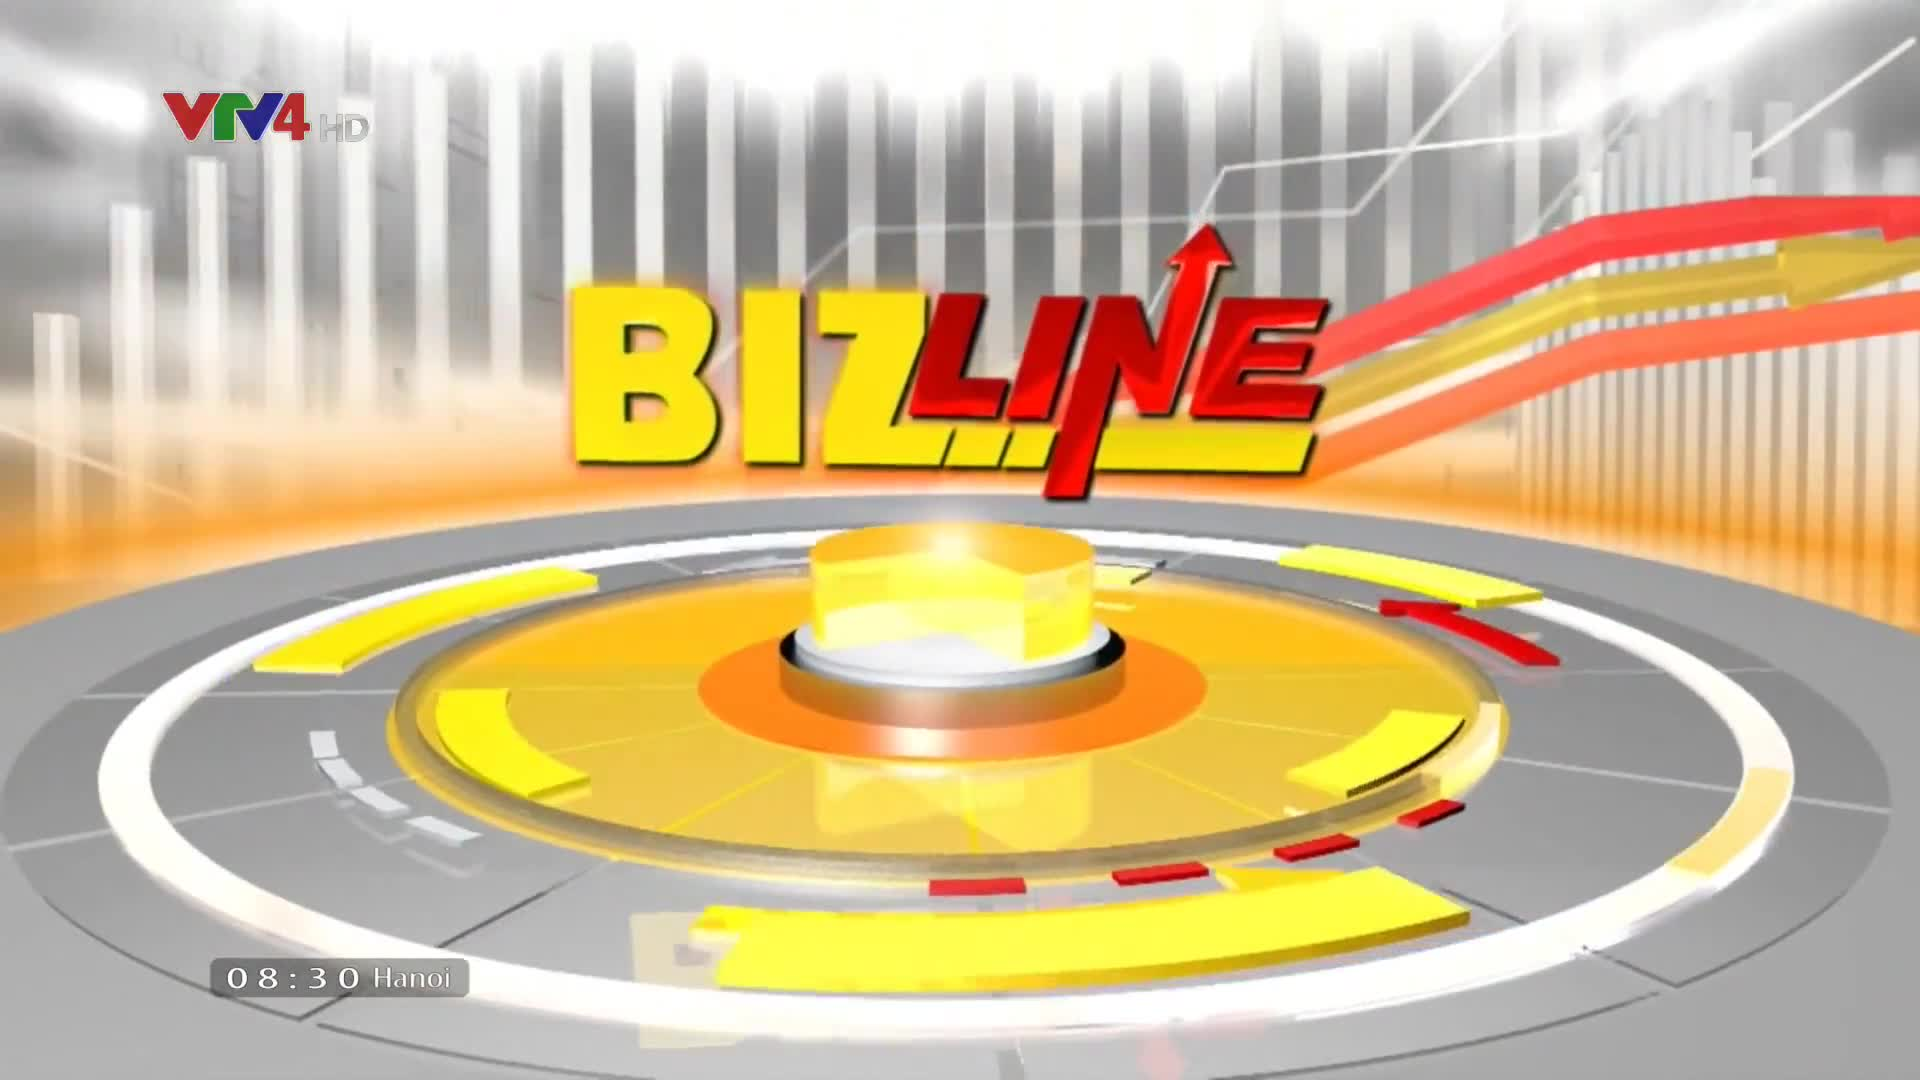 Bizline - 6/21/2020